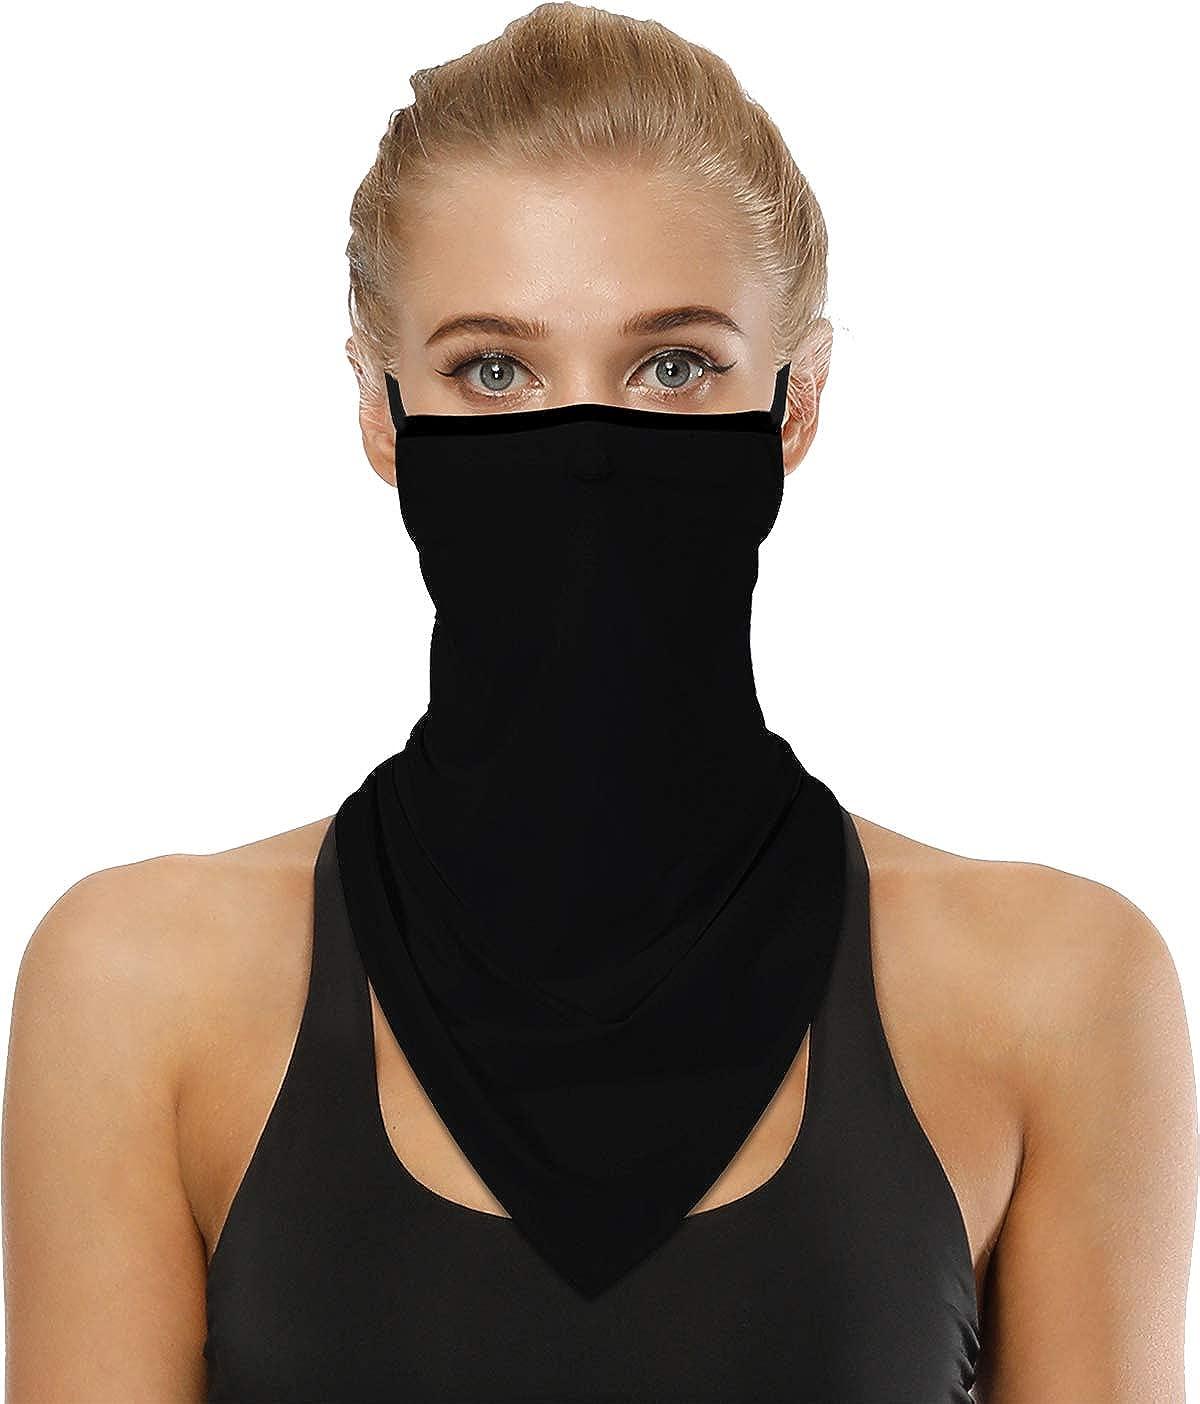 Face Bandana with Ear Loops Neck Gaiter Mask Scarf Balaclava Protection Man Woman Unisex